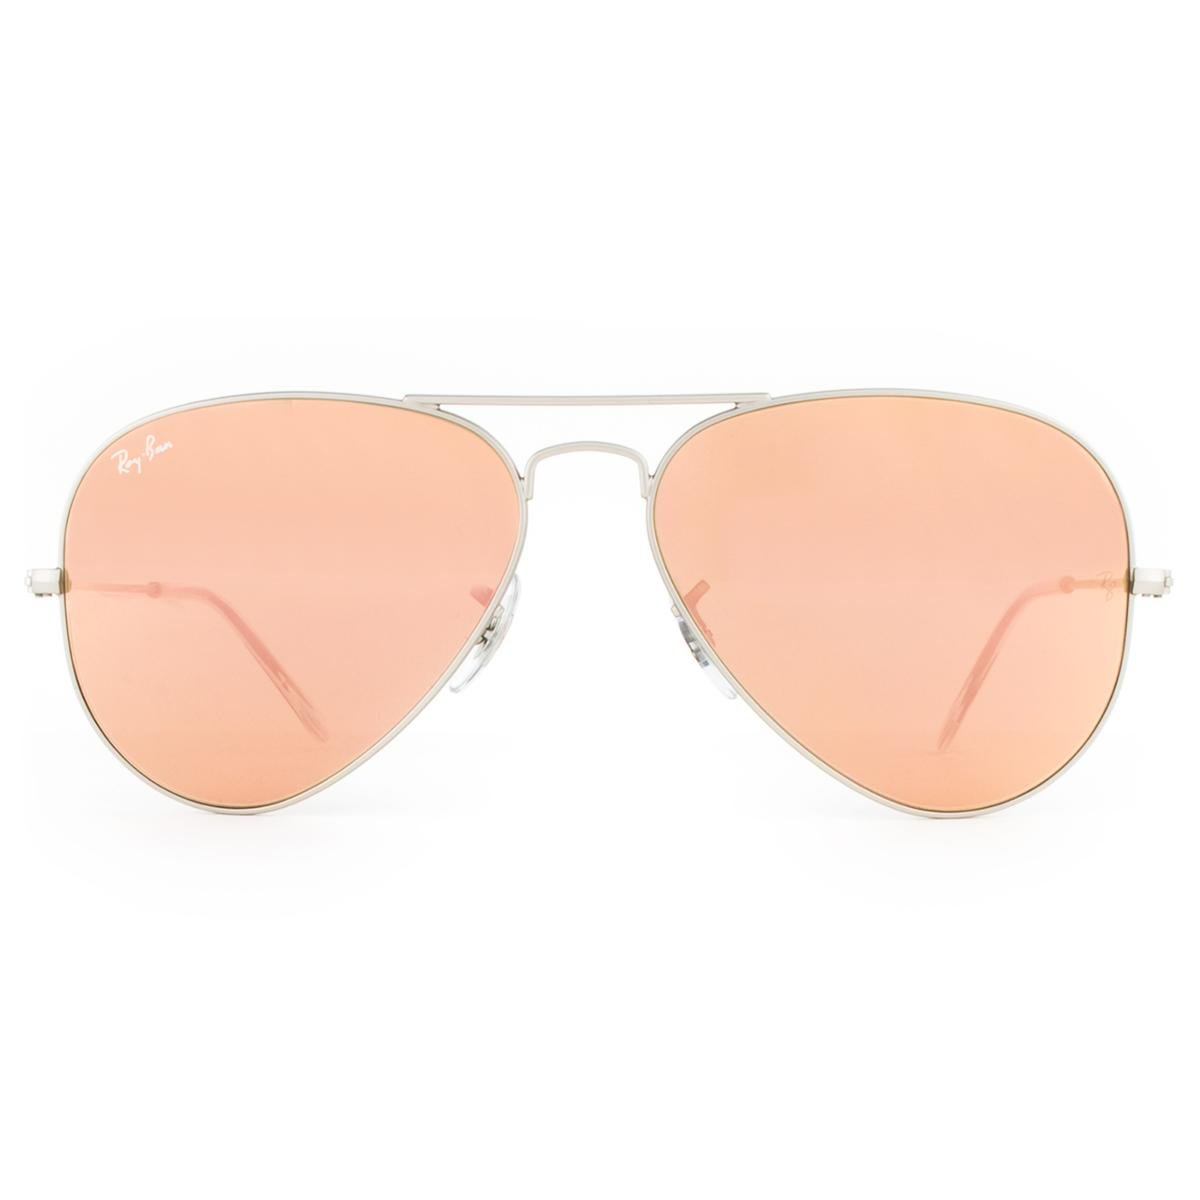 d6c0384958653 Óculos de Sol Ray Ban Aviator RB3025L 019 Z2-58 Feminino - Compre Agora    Netshoes